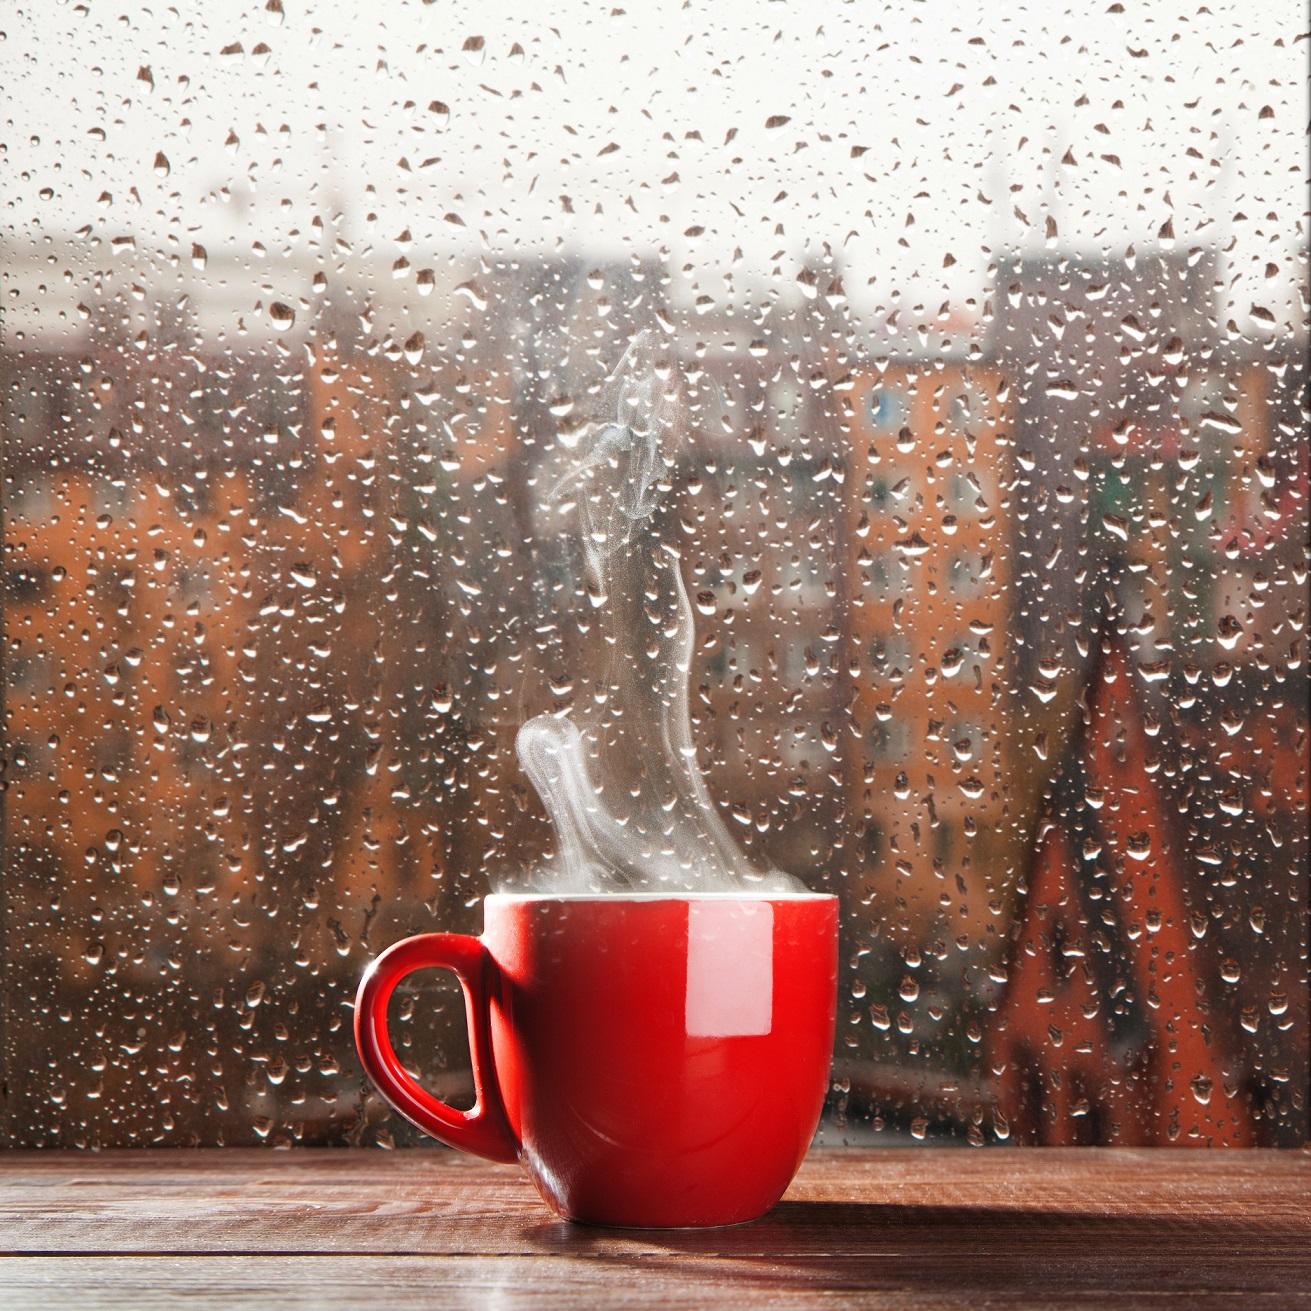 قهوه باکلاس صبحگاهی